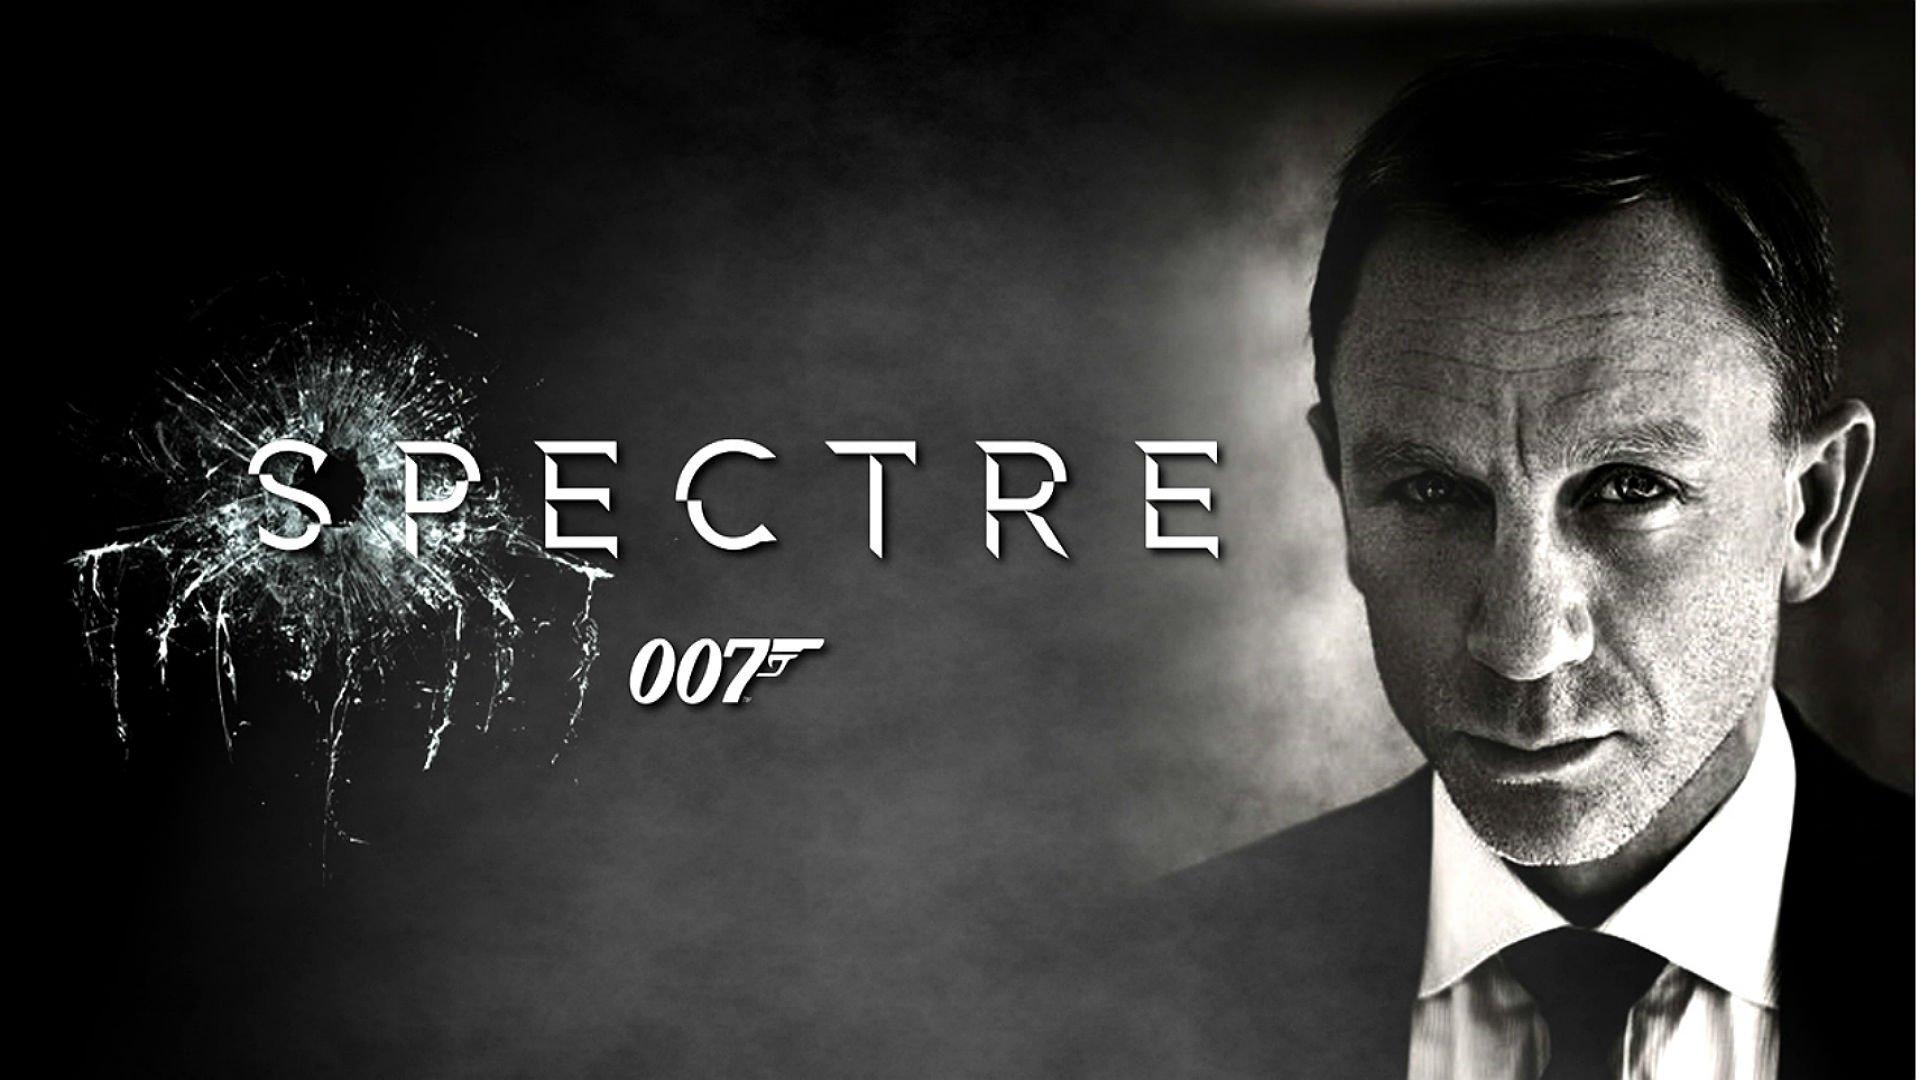 spy crime thriller mystery 1spectre 007 poster wallpaper background 1920x1080